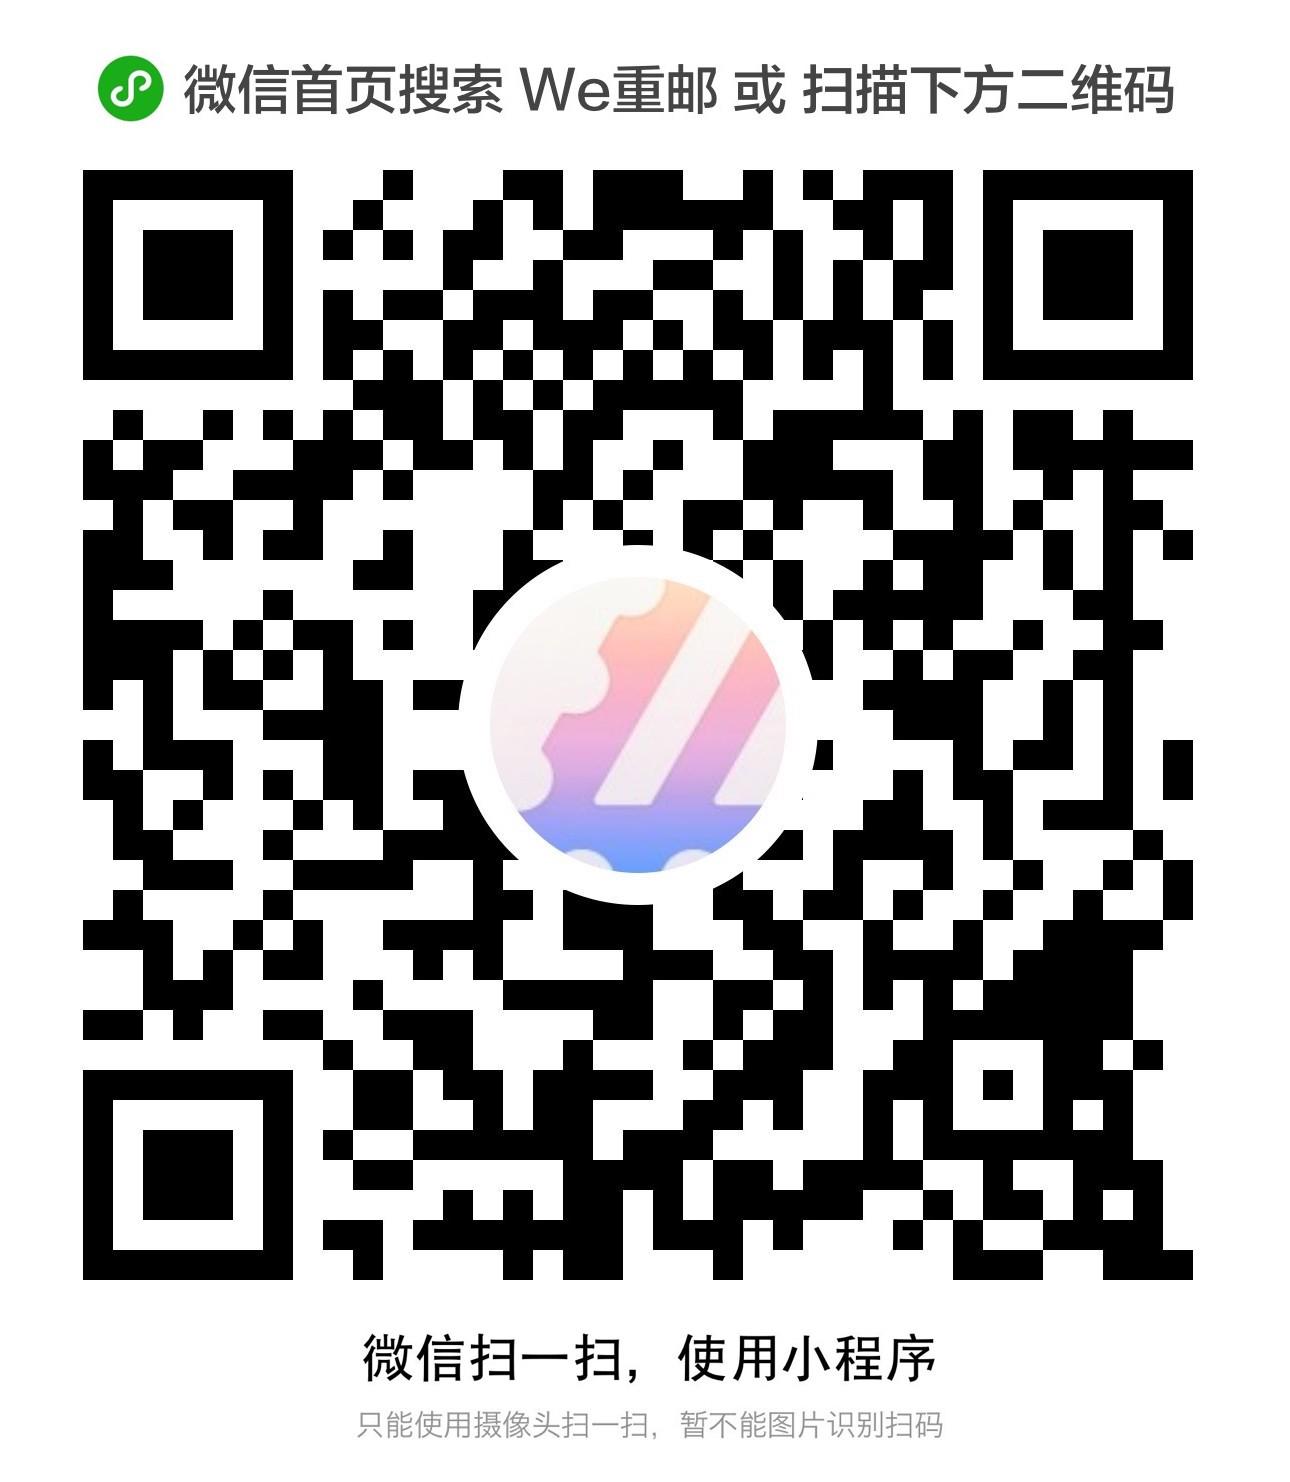 lanshan-studio/wecqupt